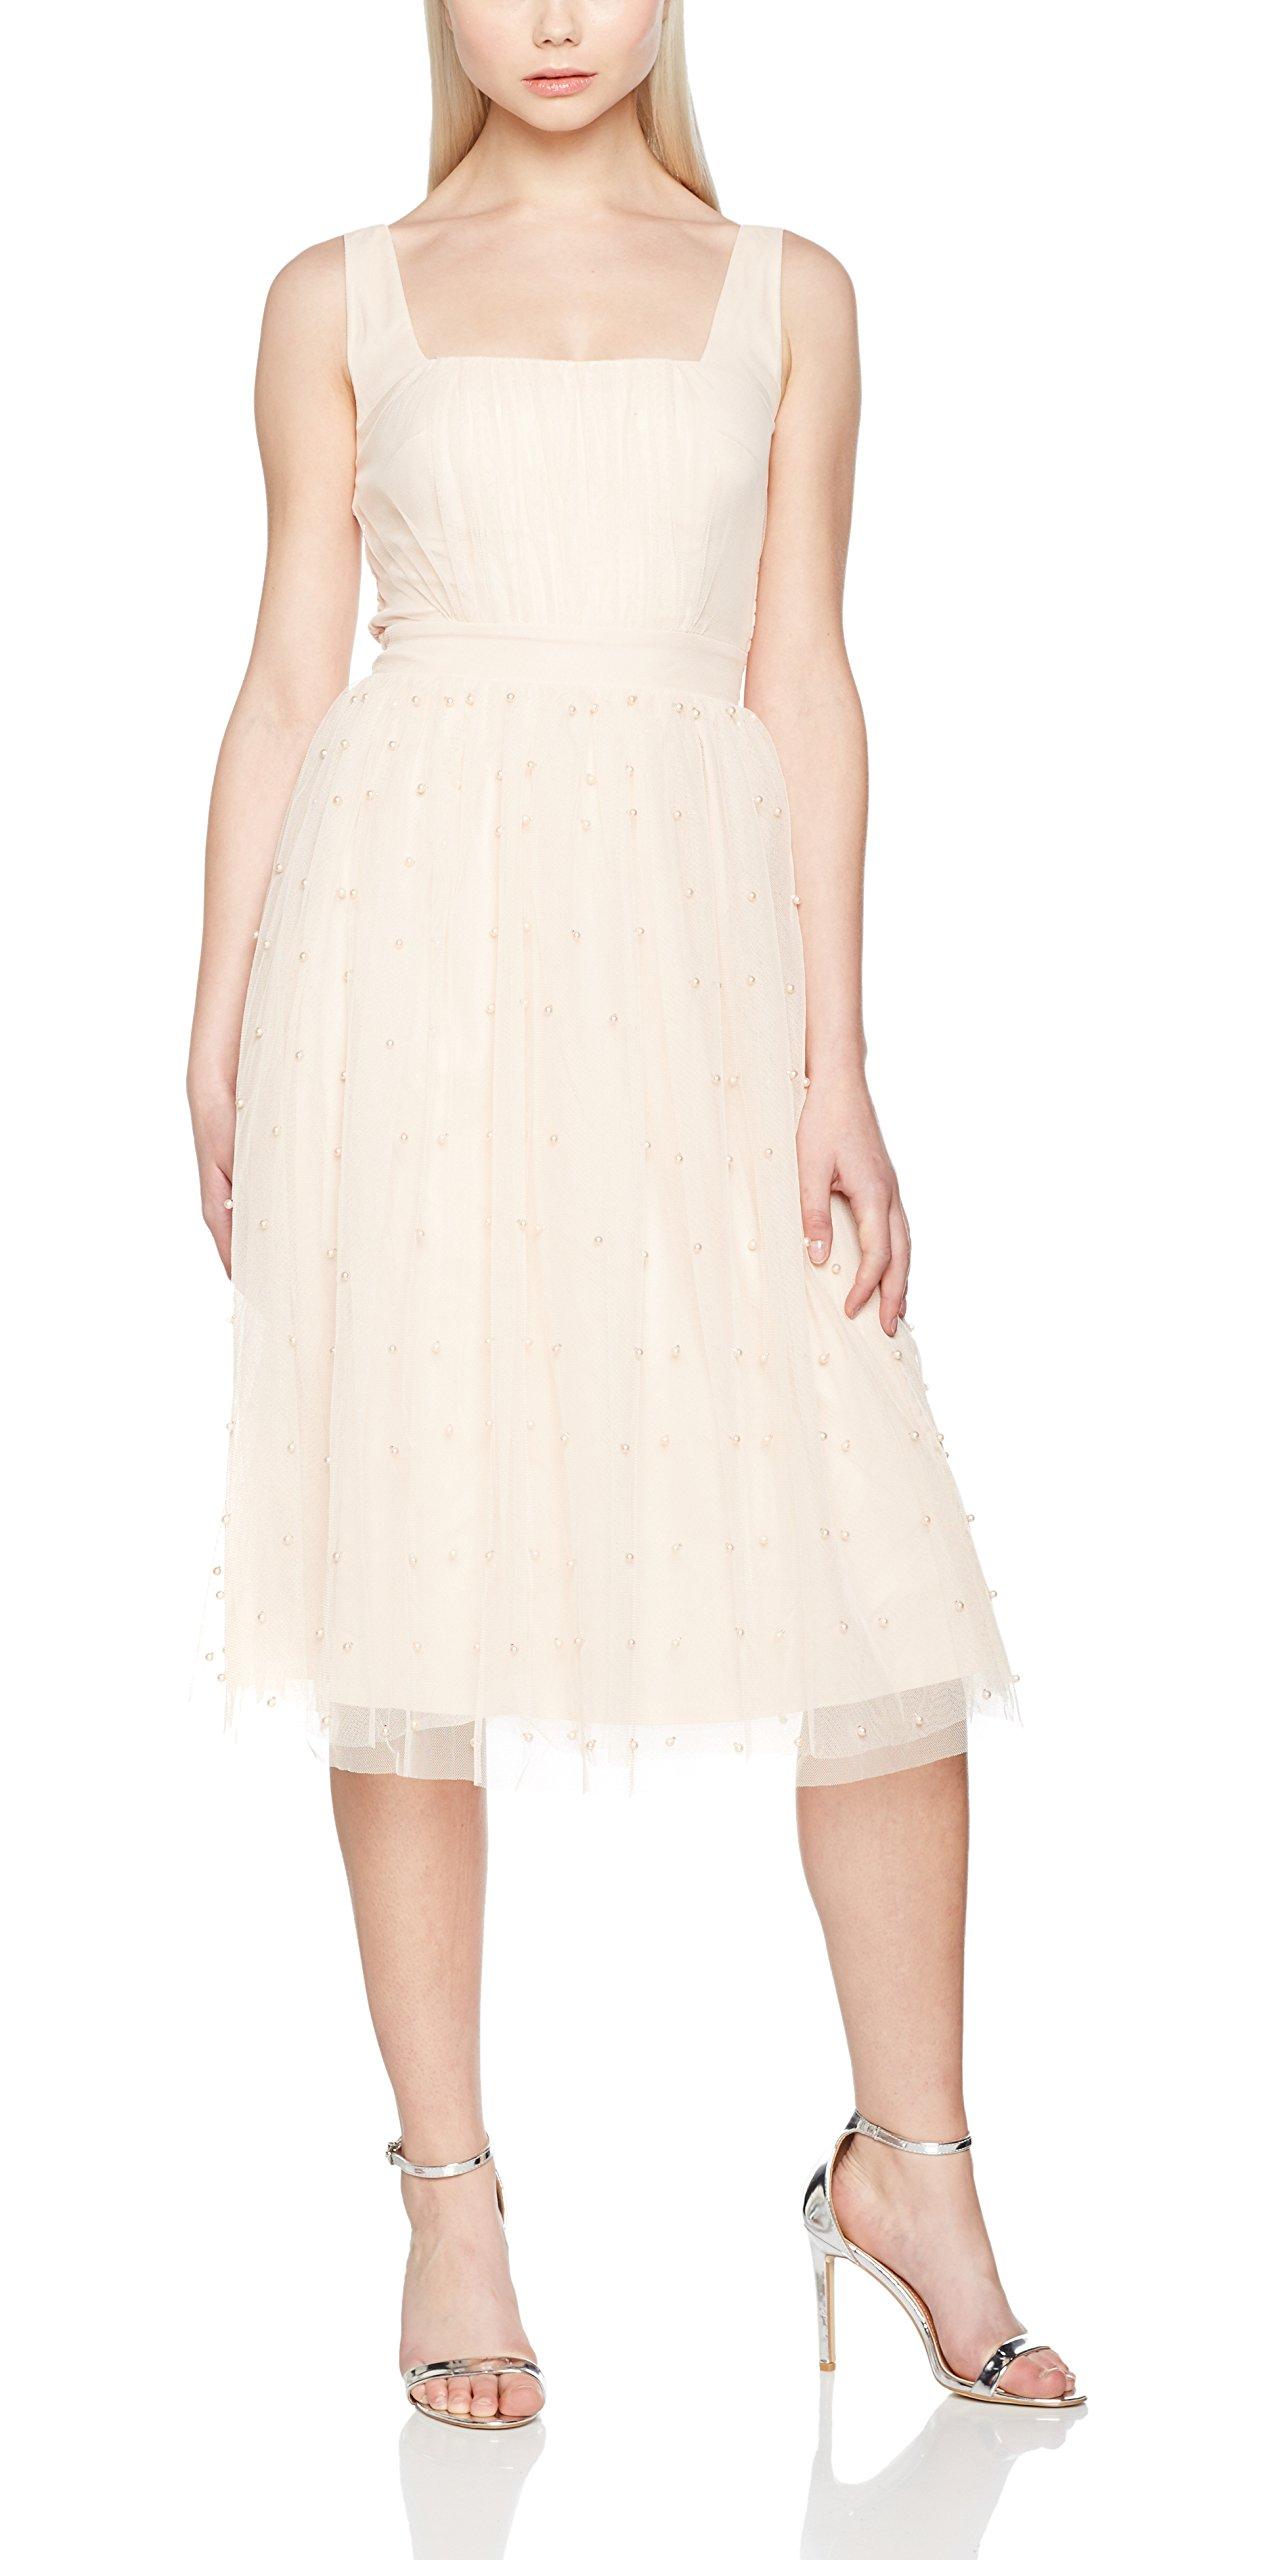 Femme Mesh Fabric Little RobePinknude42 Mistress Pearl yb76fg